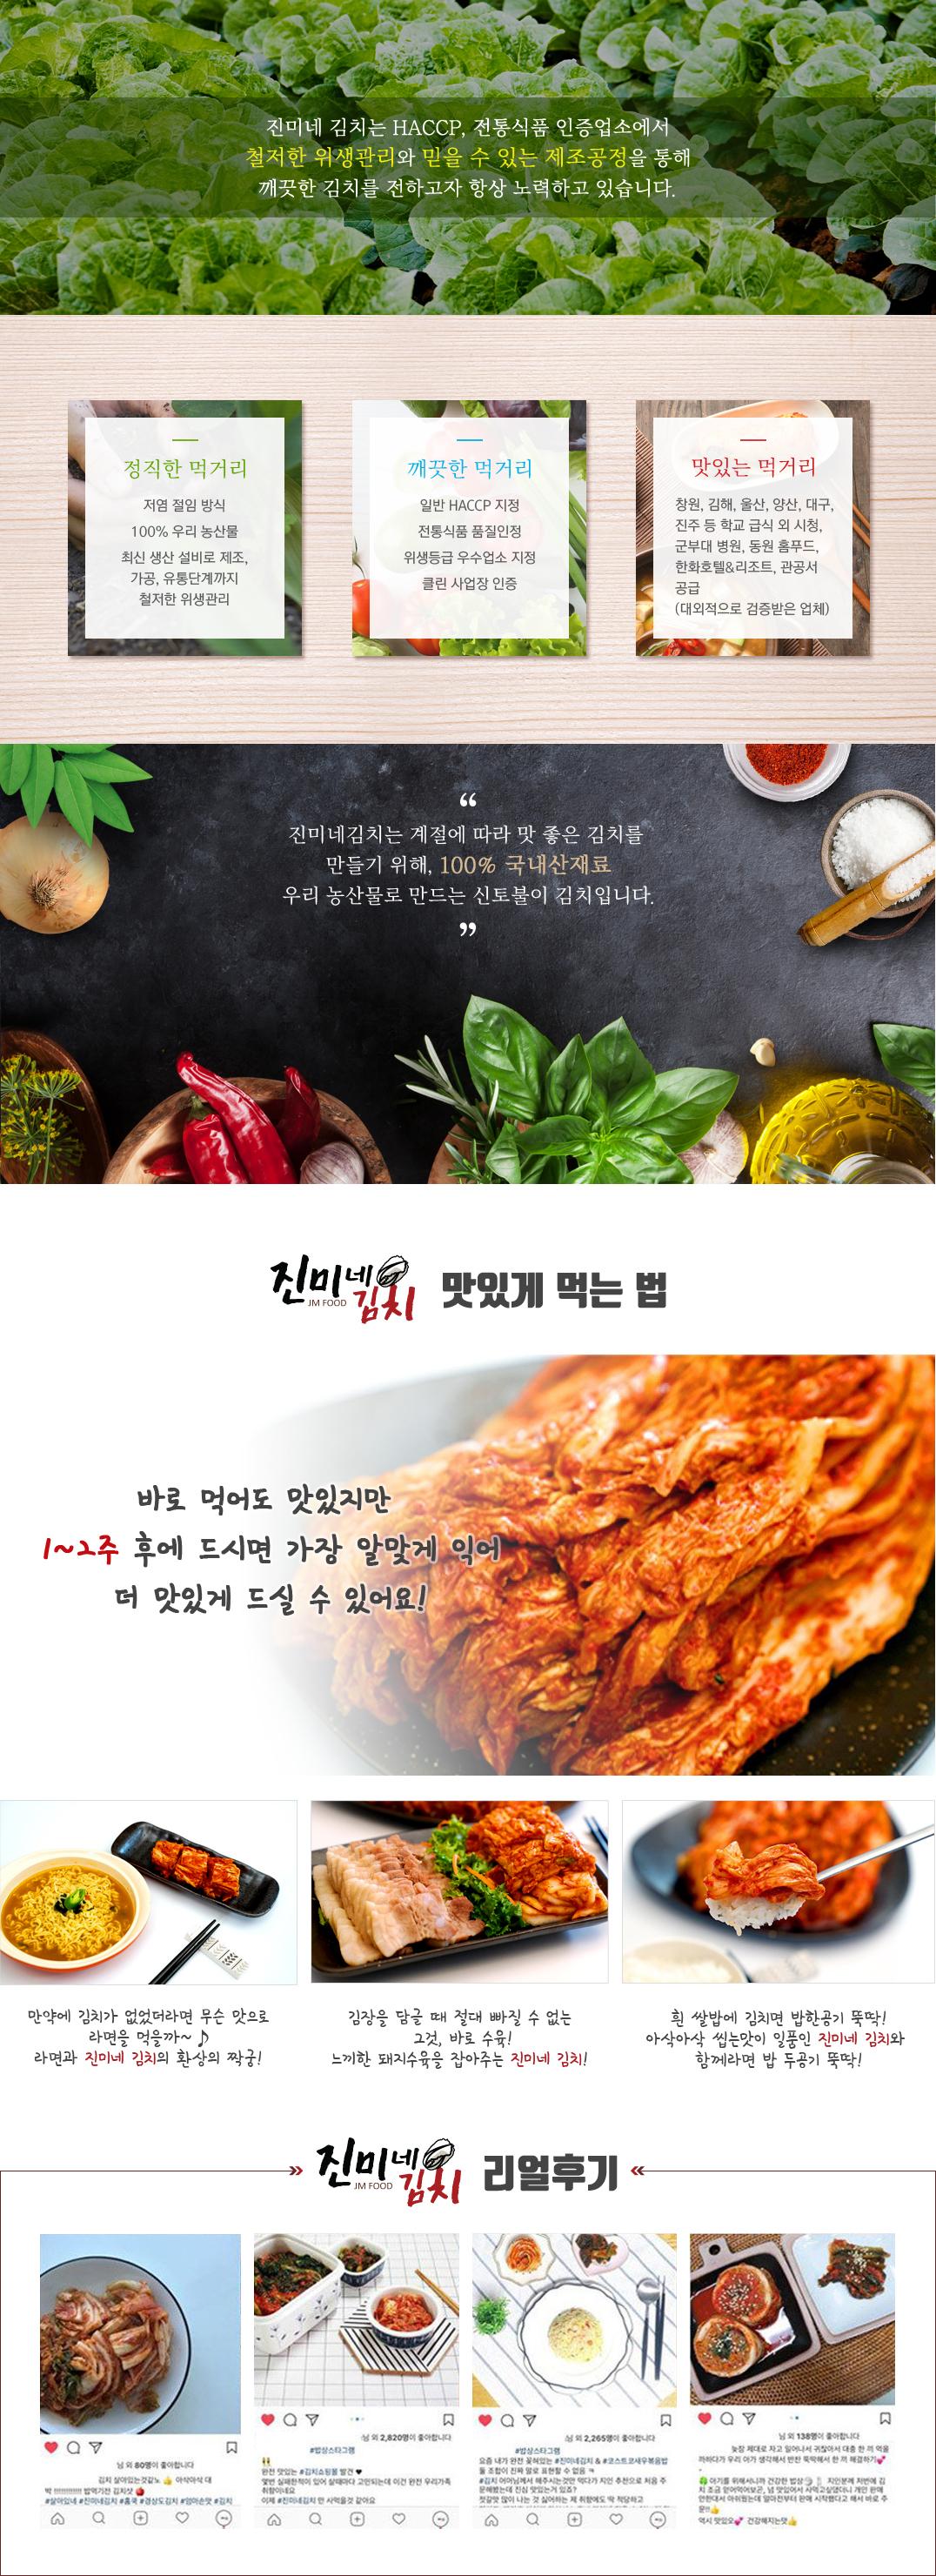 kimchipage_1.jpg